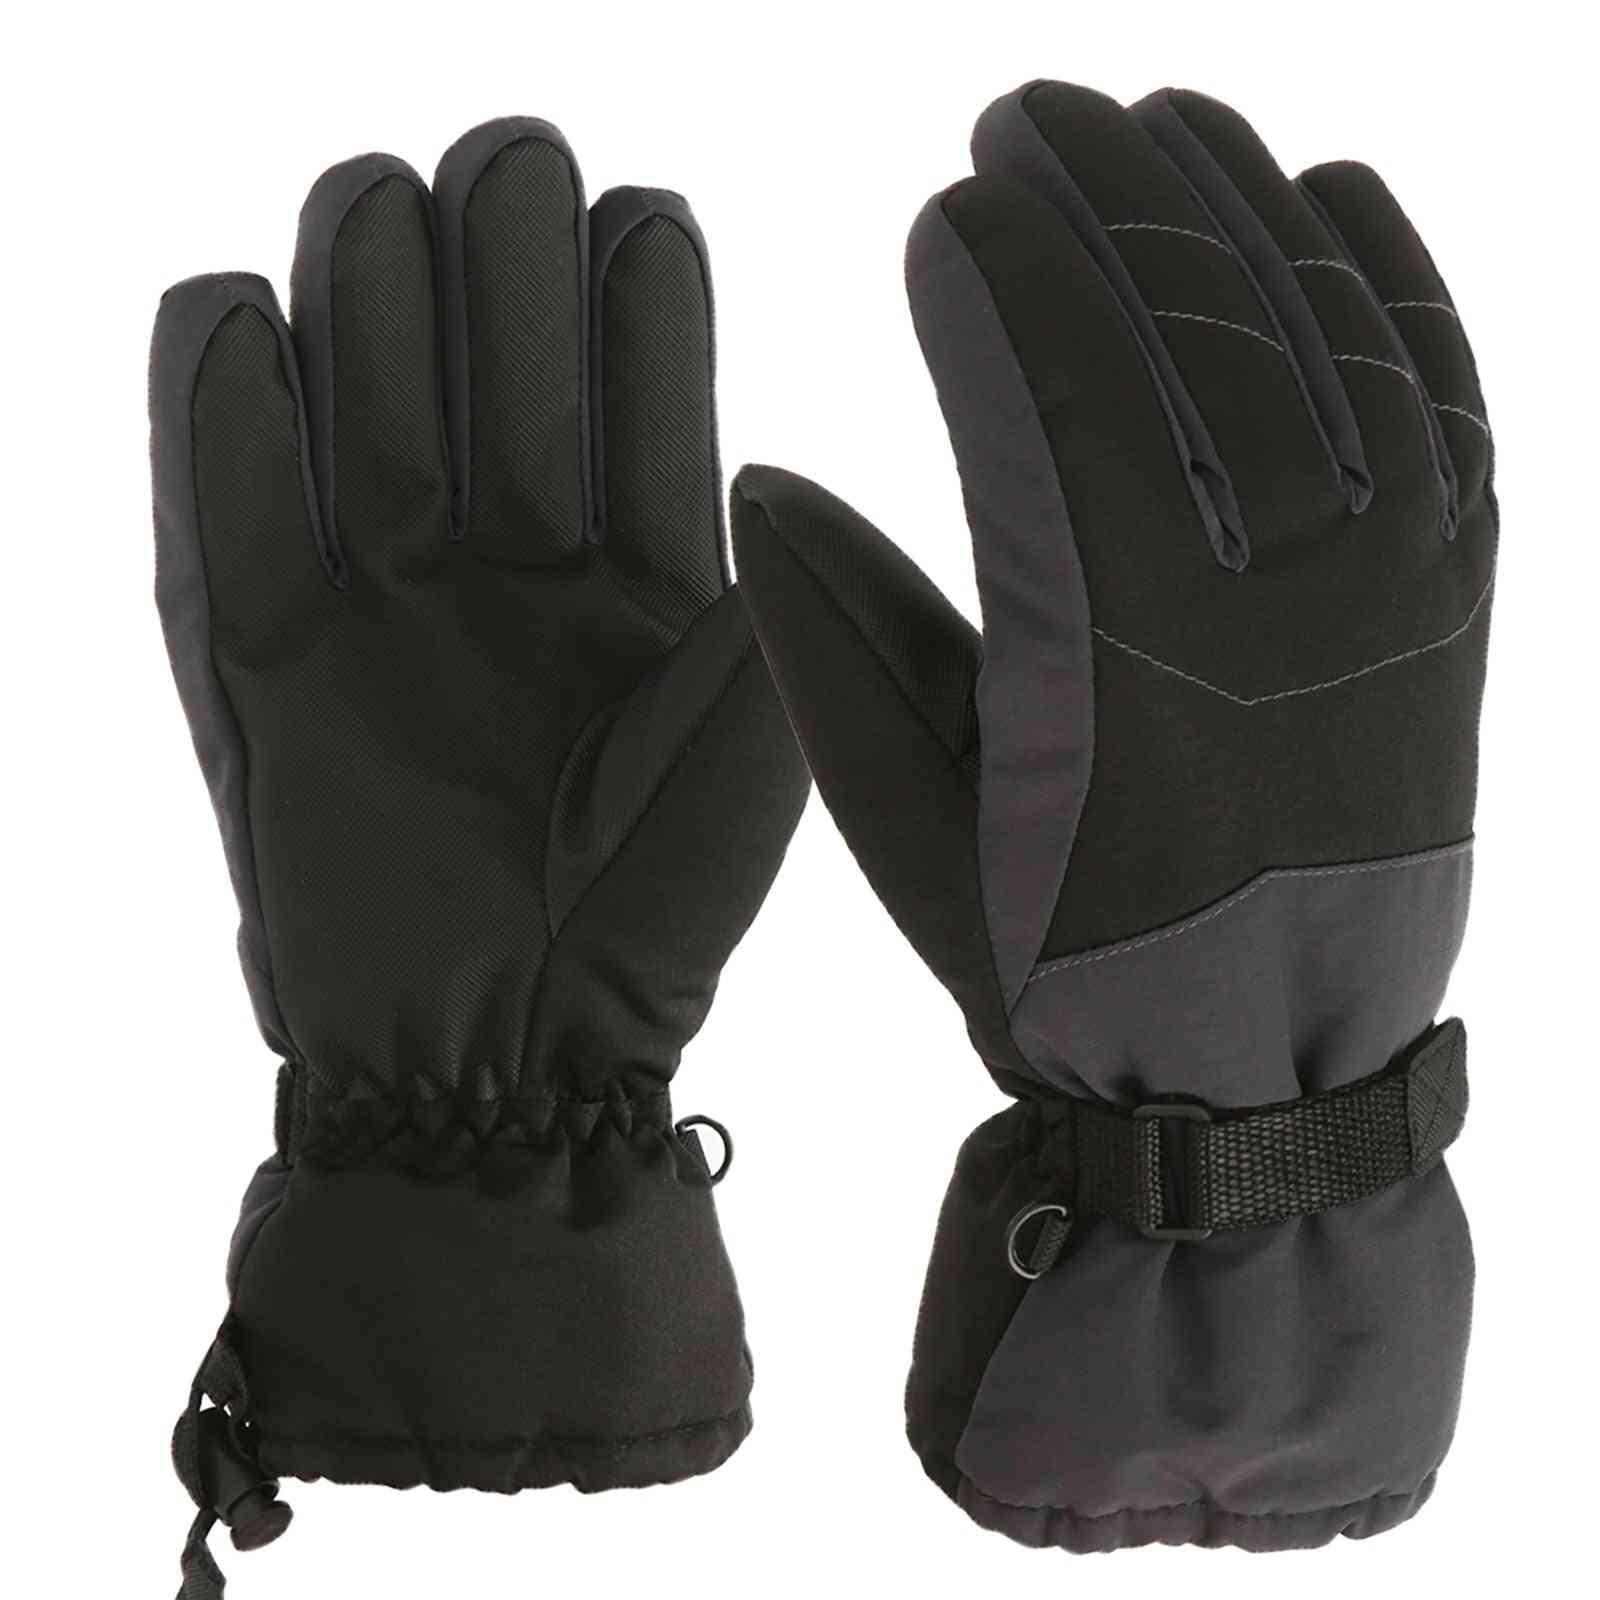 Children's Warm Ski Riding Winter Windproof And Waterproof Gloves